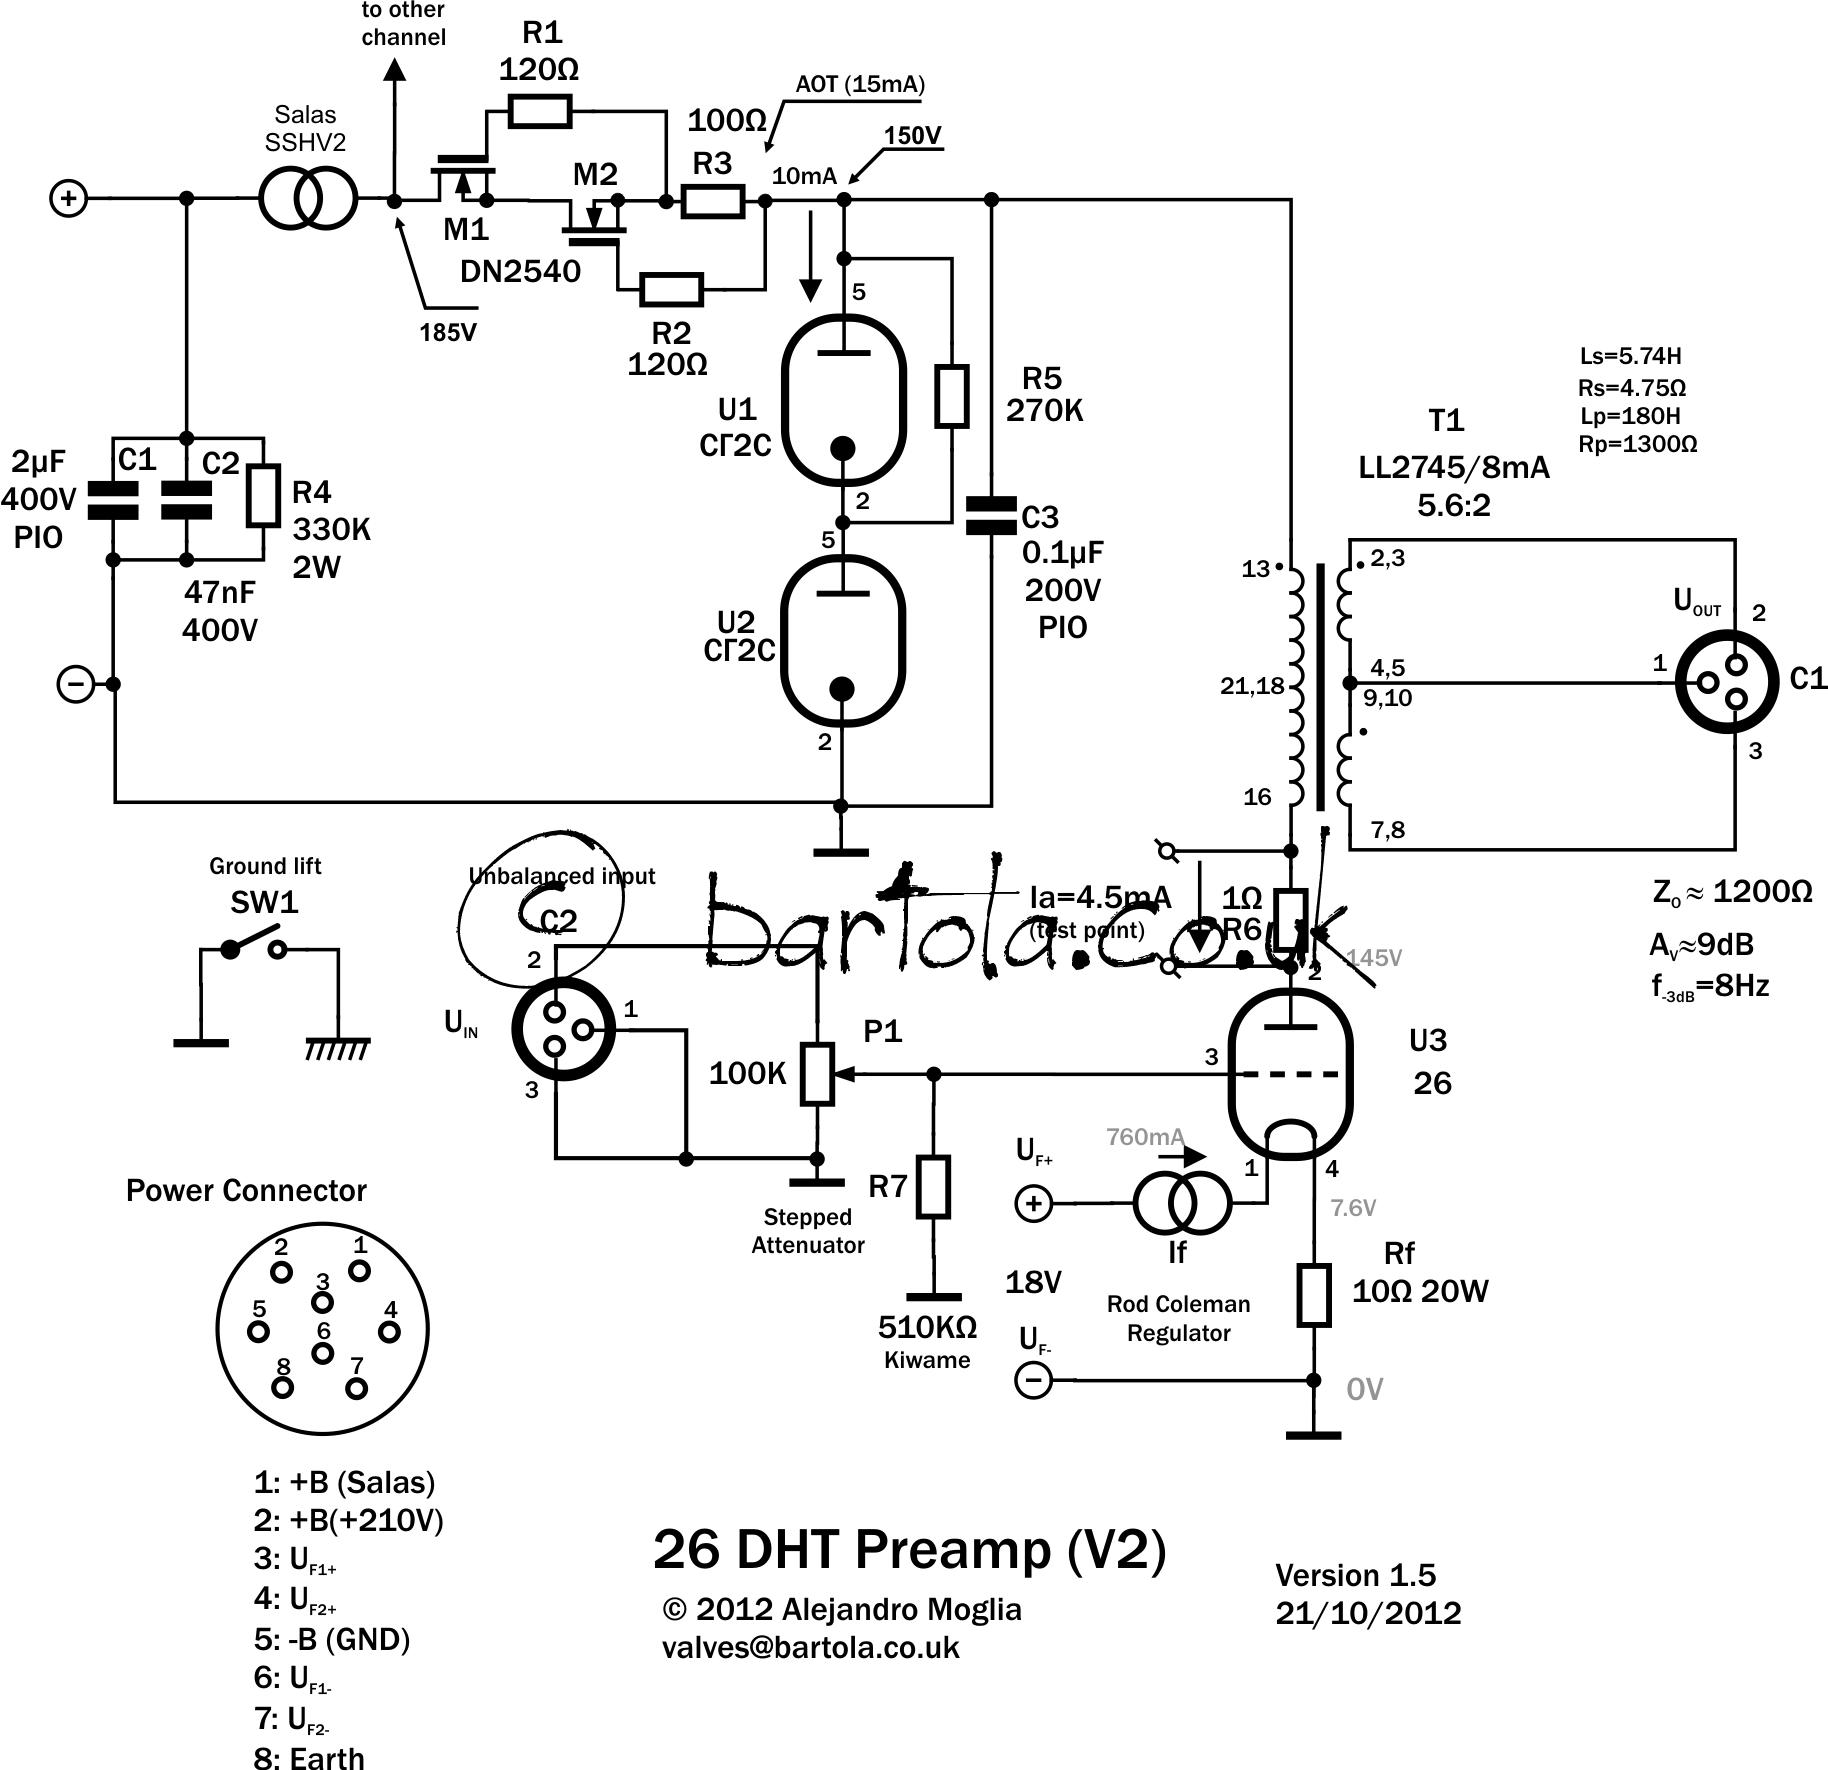 26 Dht Pre Amplifier Gen2 Bartola Valves